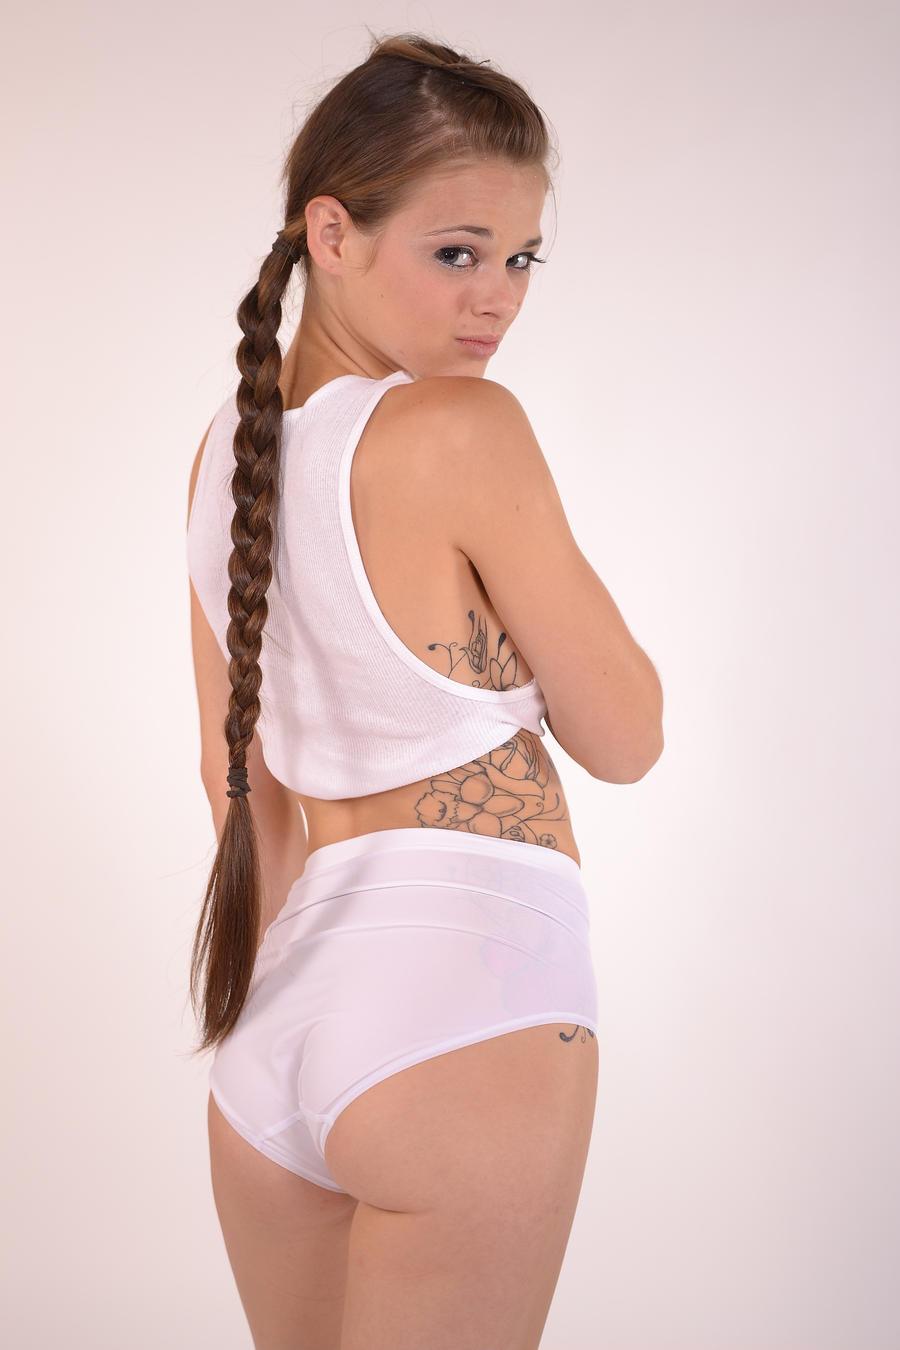 Teen girls in tight tank tops hot girls wallpaper